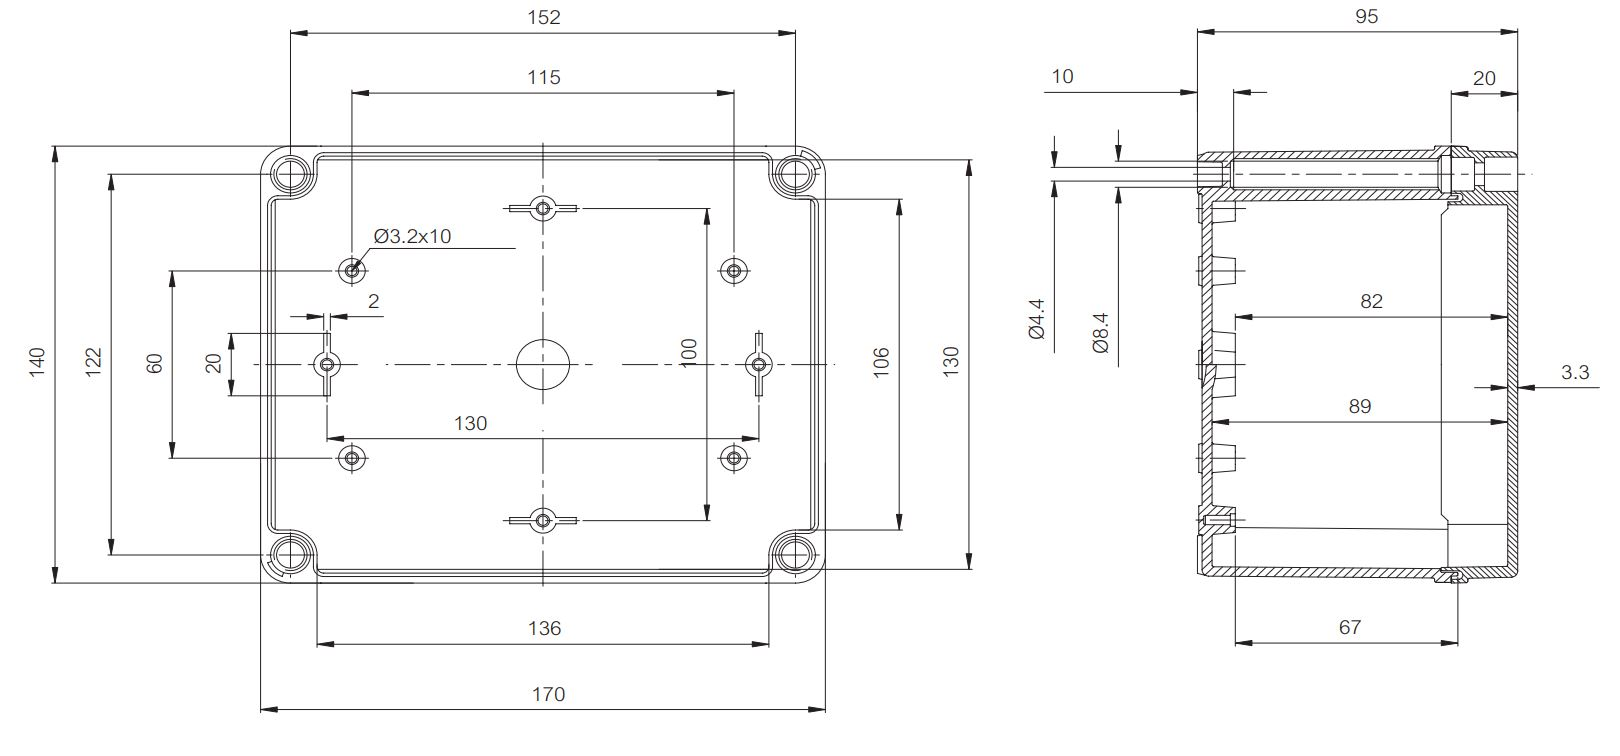 Bmv 700 Accu Monitor Victron Energy Vdo Marine Tachometer Wiring Diagram 700h Shunt Box